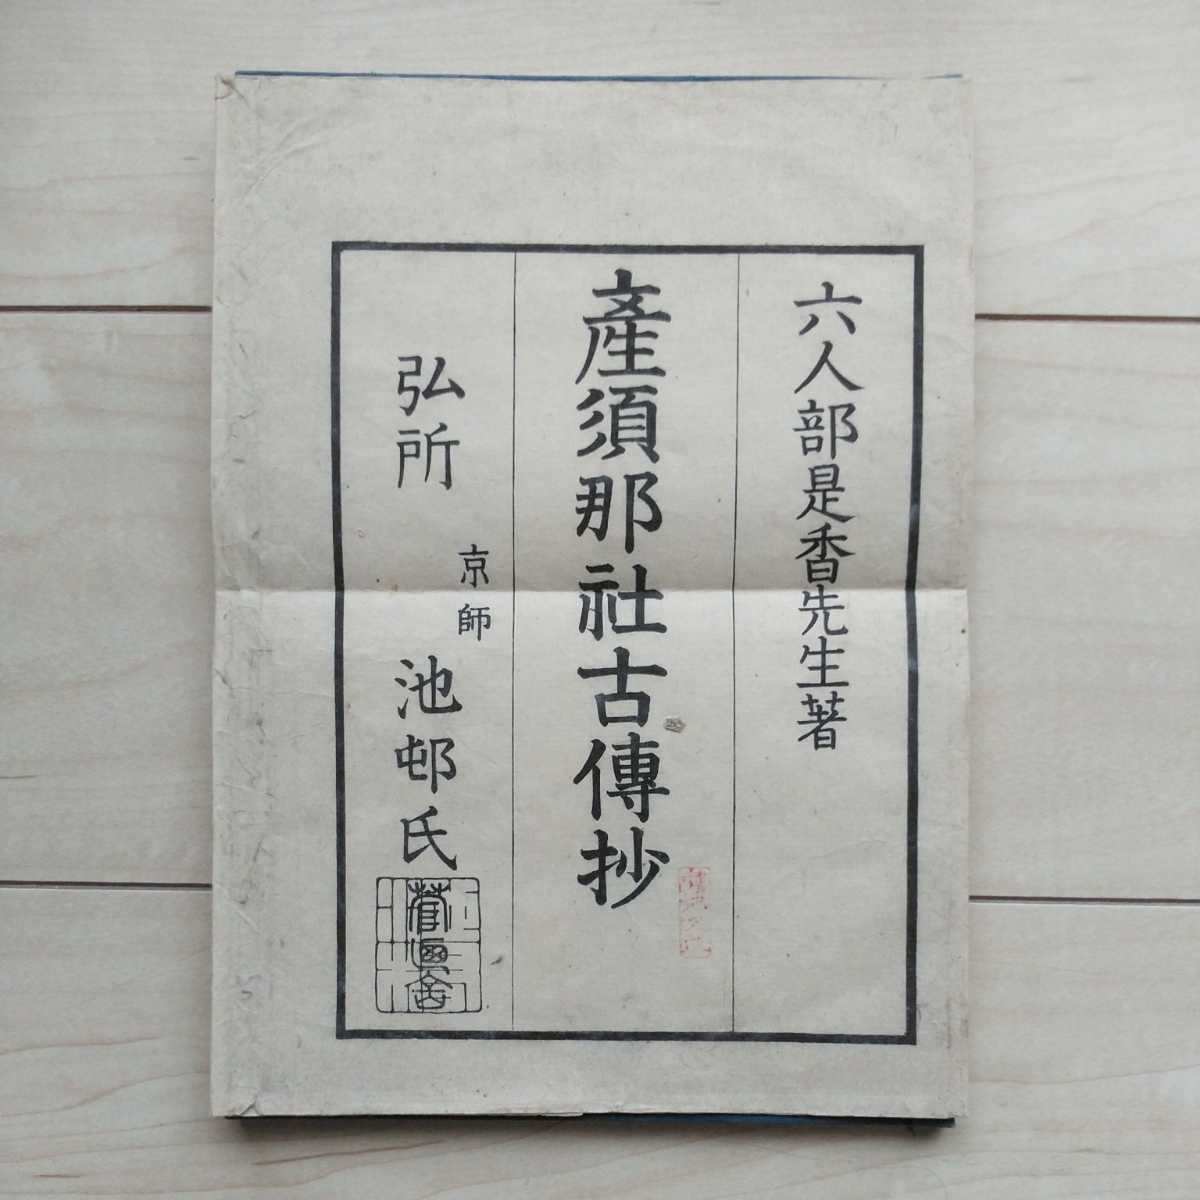 ヤフオク! - 『産須那社古傳抄』安政4年(1857年)成立 六人部...